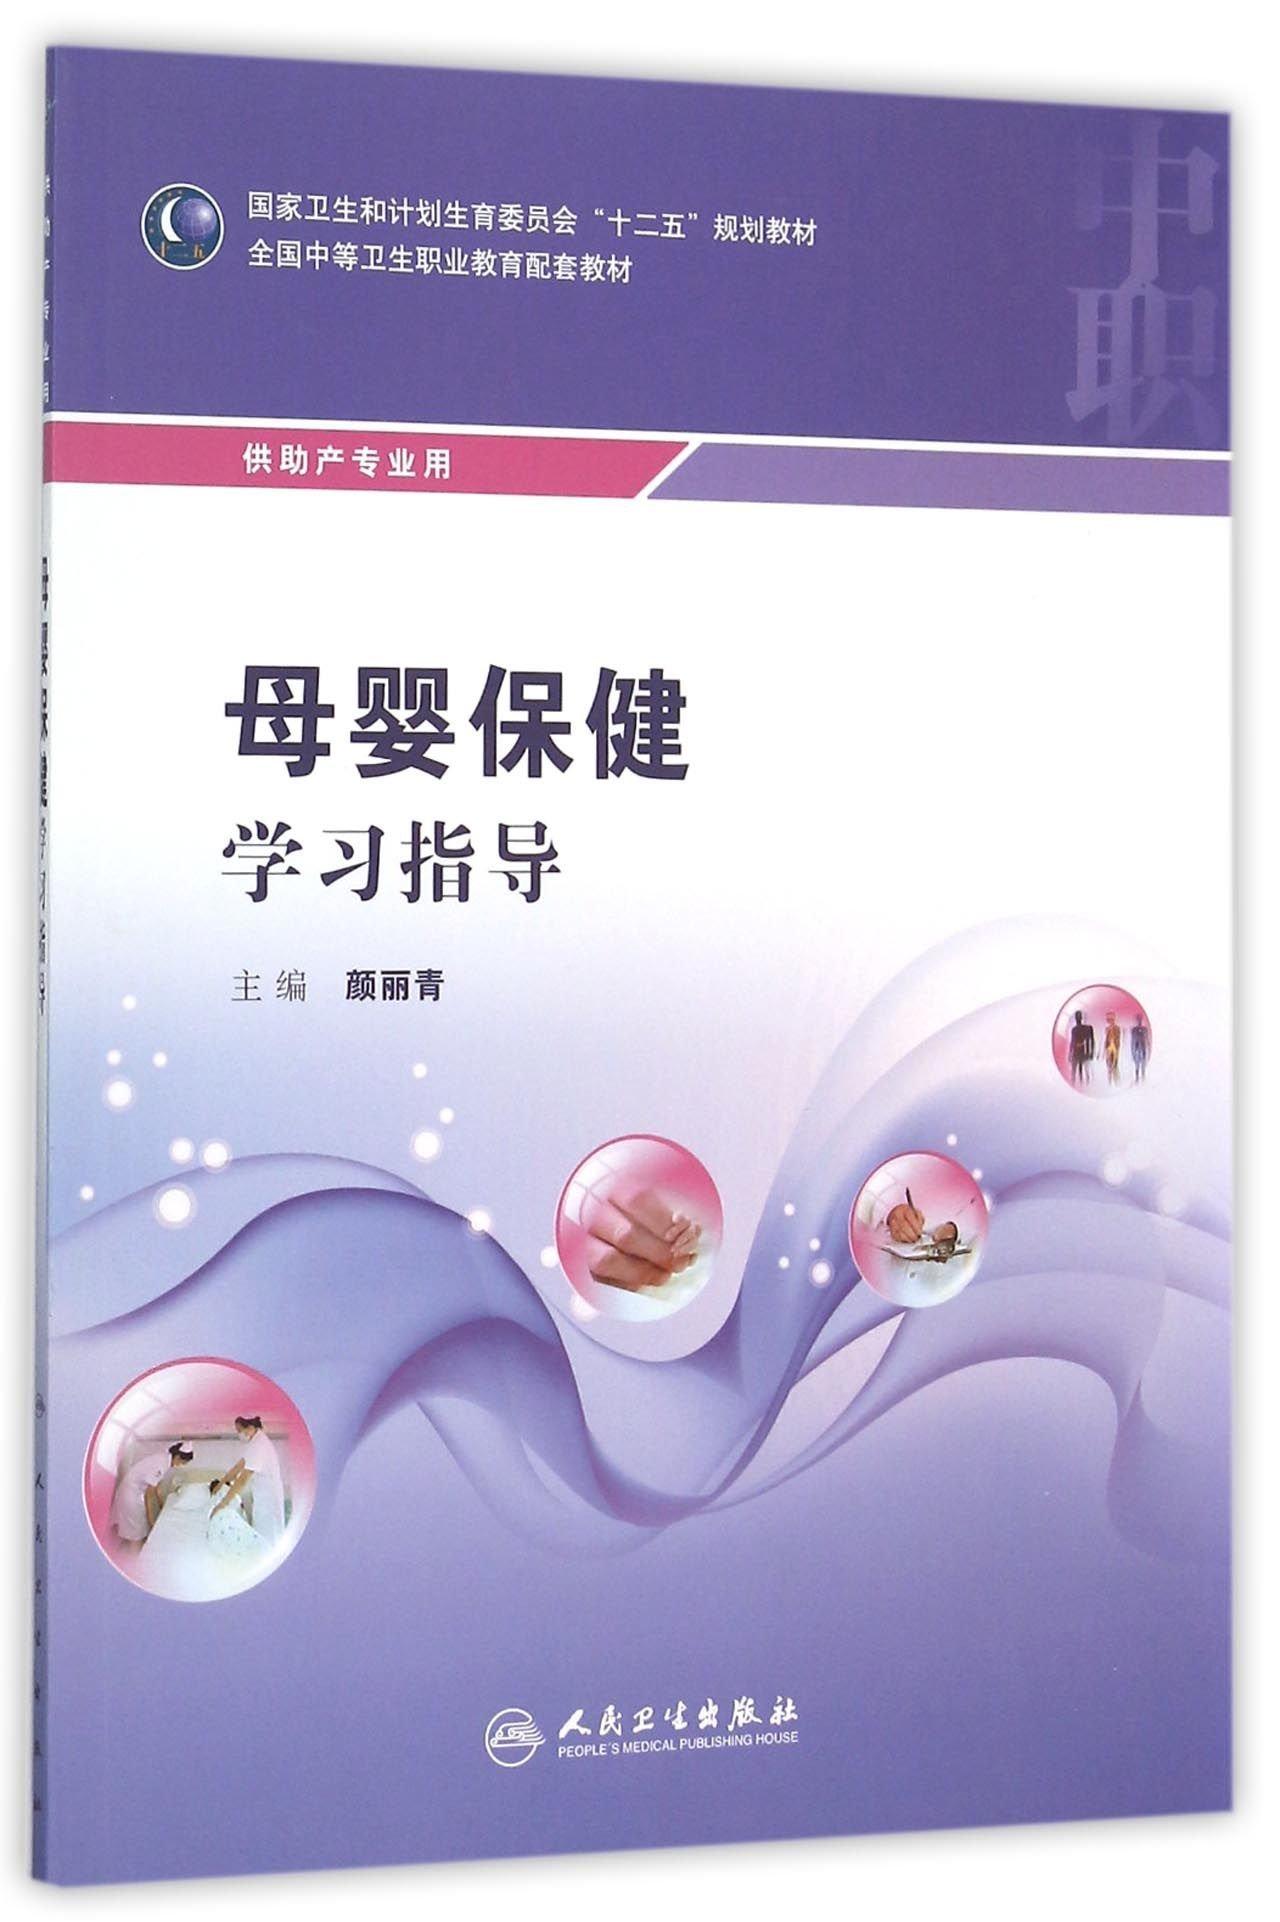 Download 母婴保健学习指导(供助产专业用全国中等卫生职业教育配套教材) pdf epub